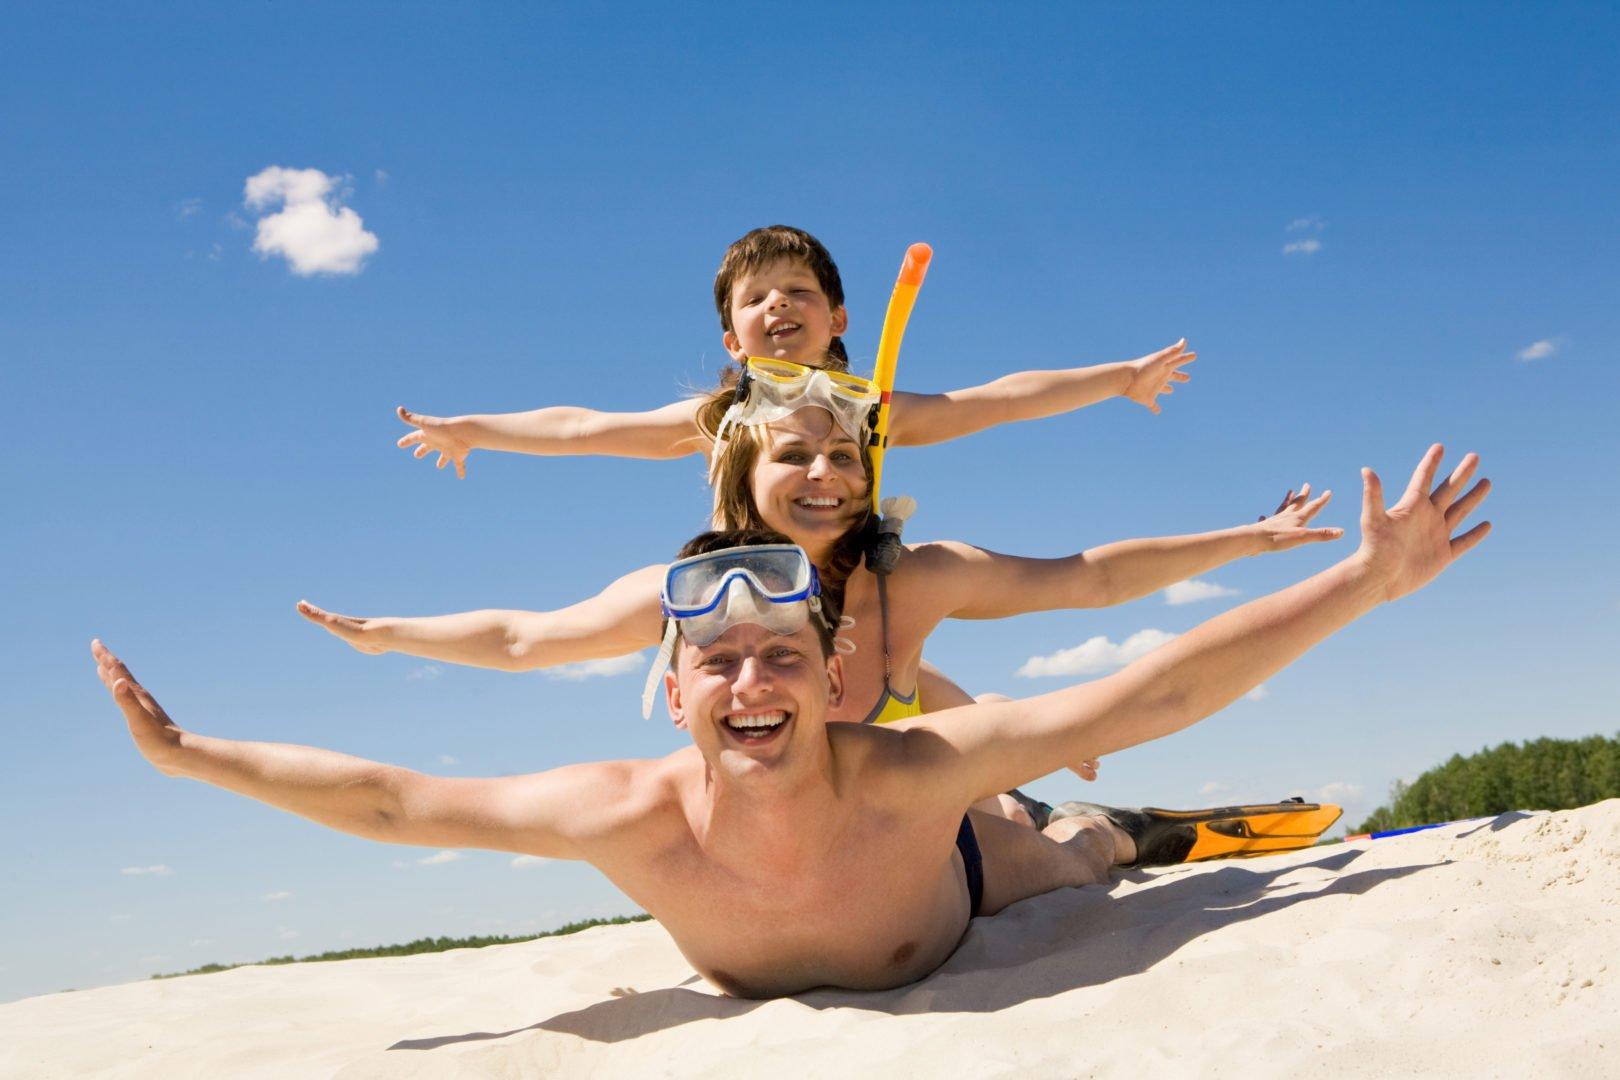 Familie, Kind, Strand, Urlaub, Reise, Spaß